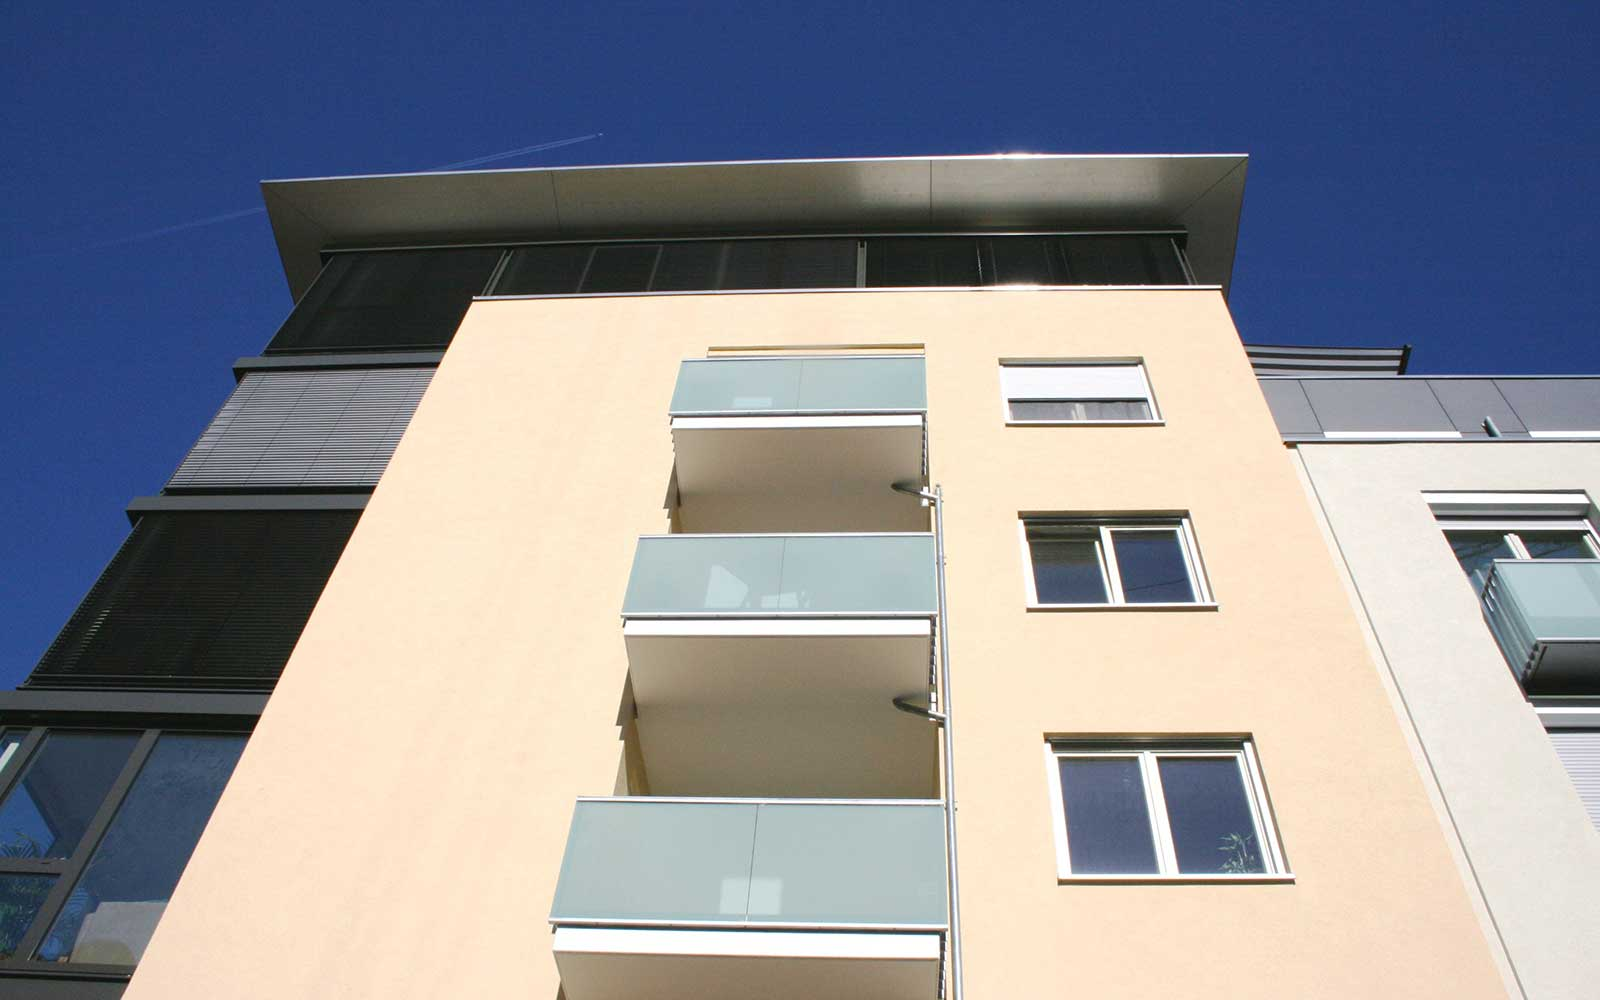 Mehrfamilienhaus in Heidelberg-Neuenheim 2012